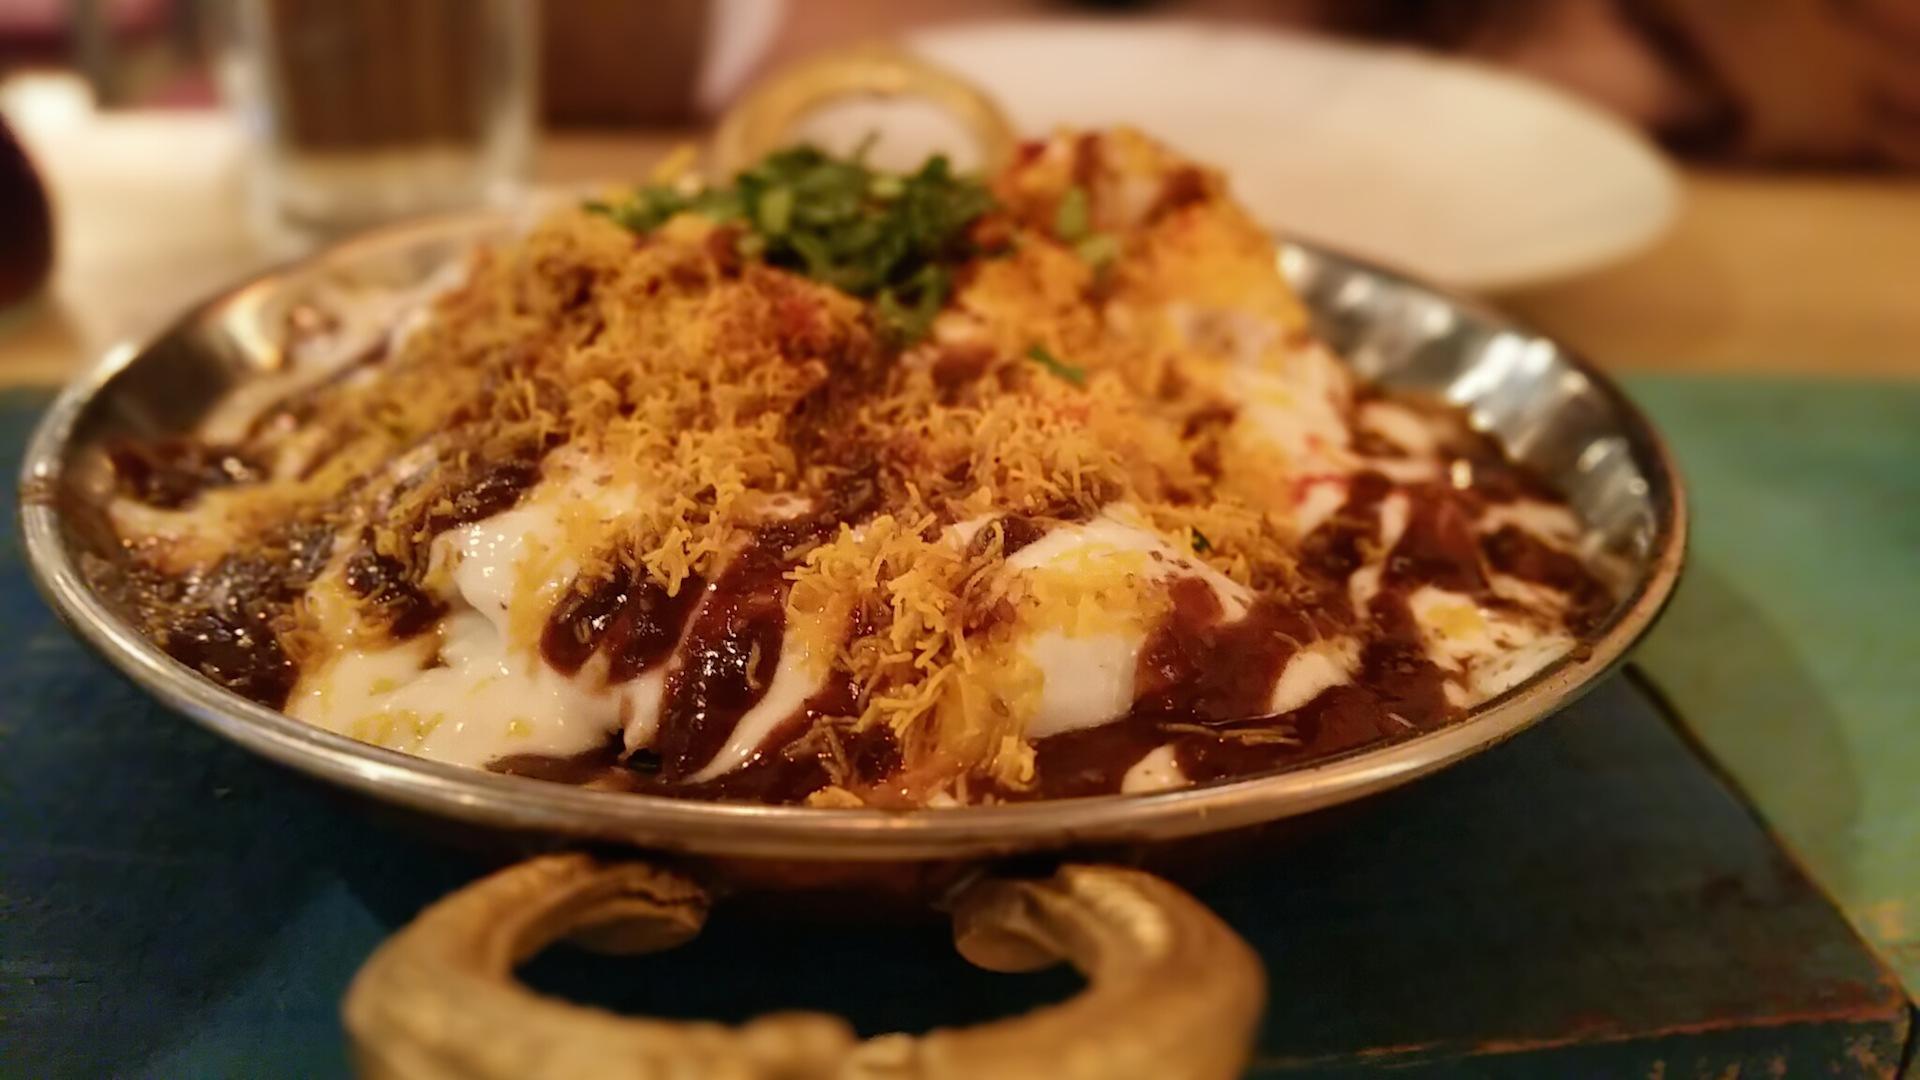 Inito halal food guy for Cafe le jardin bell lane london